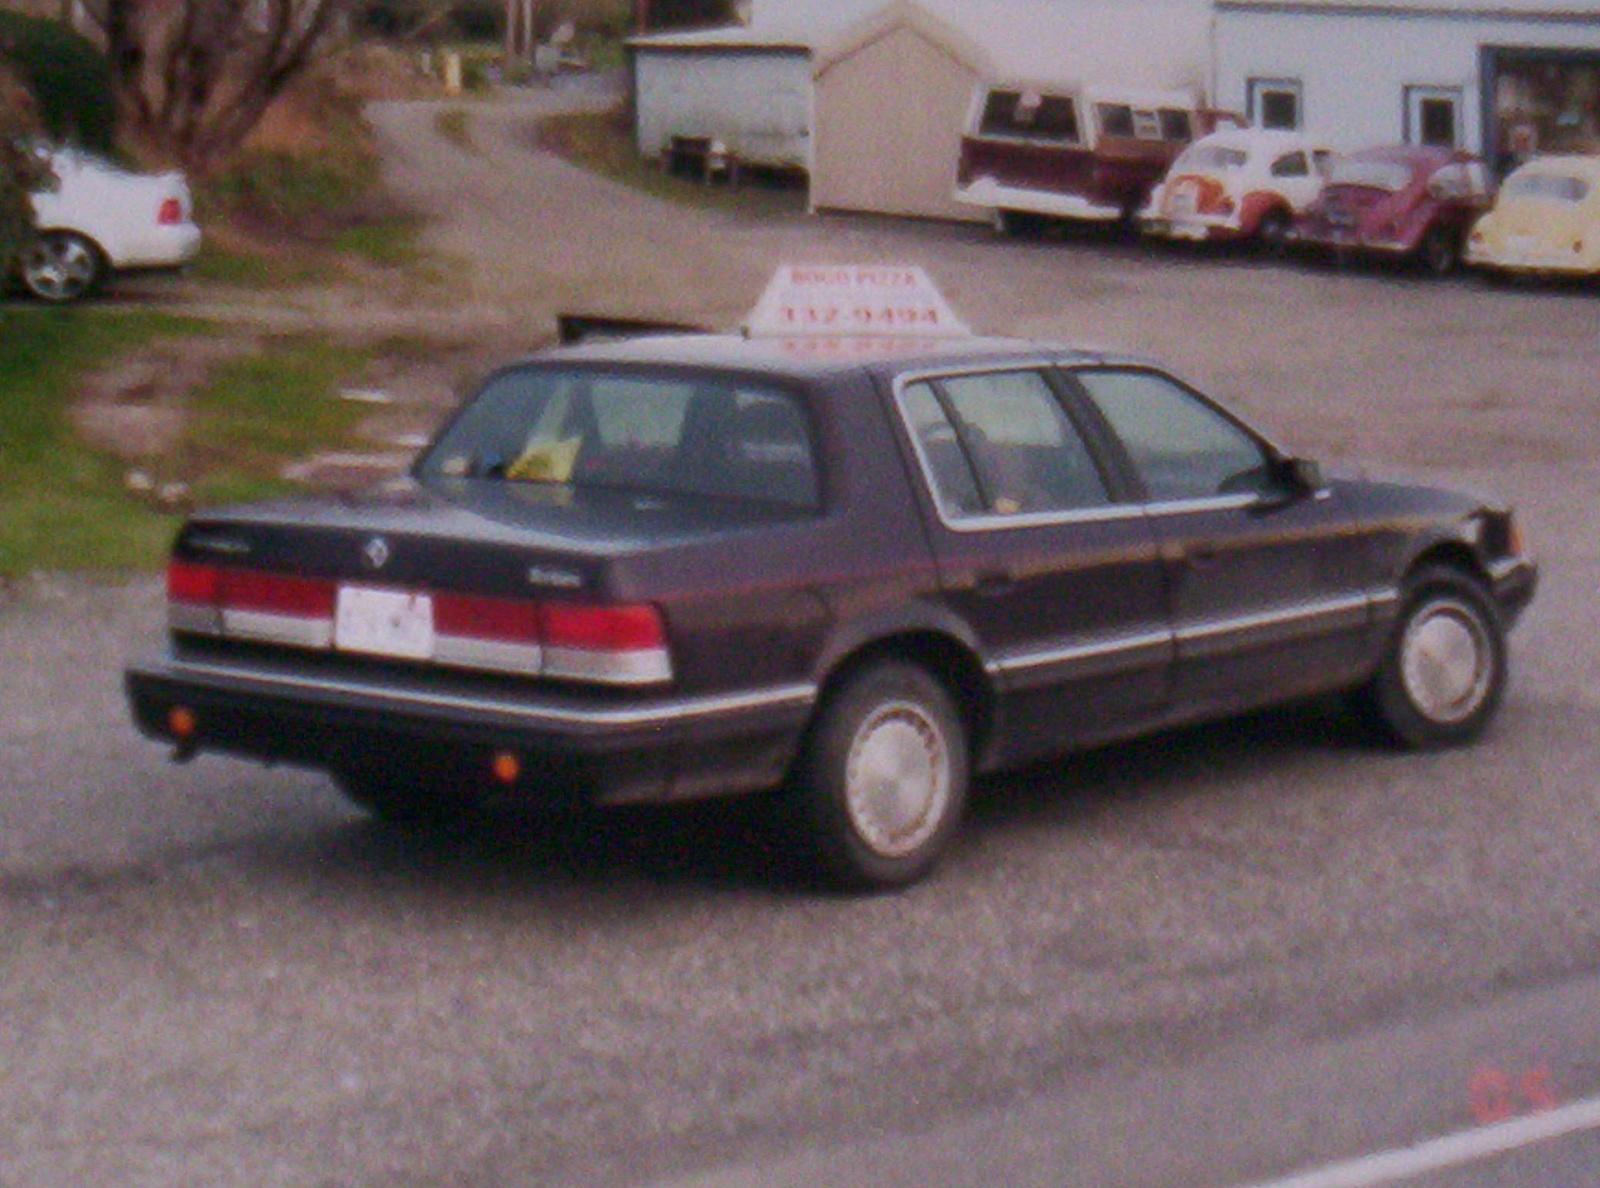 1994 Plymouth Sundance Fuse Box Wiring Diagrams 91 Acclaim Engine Diagram 1991 Dodge Spirit Interior